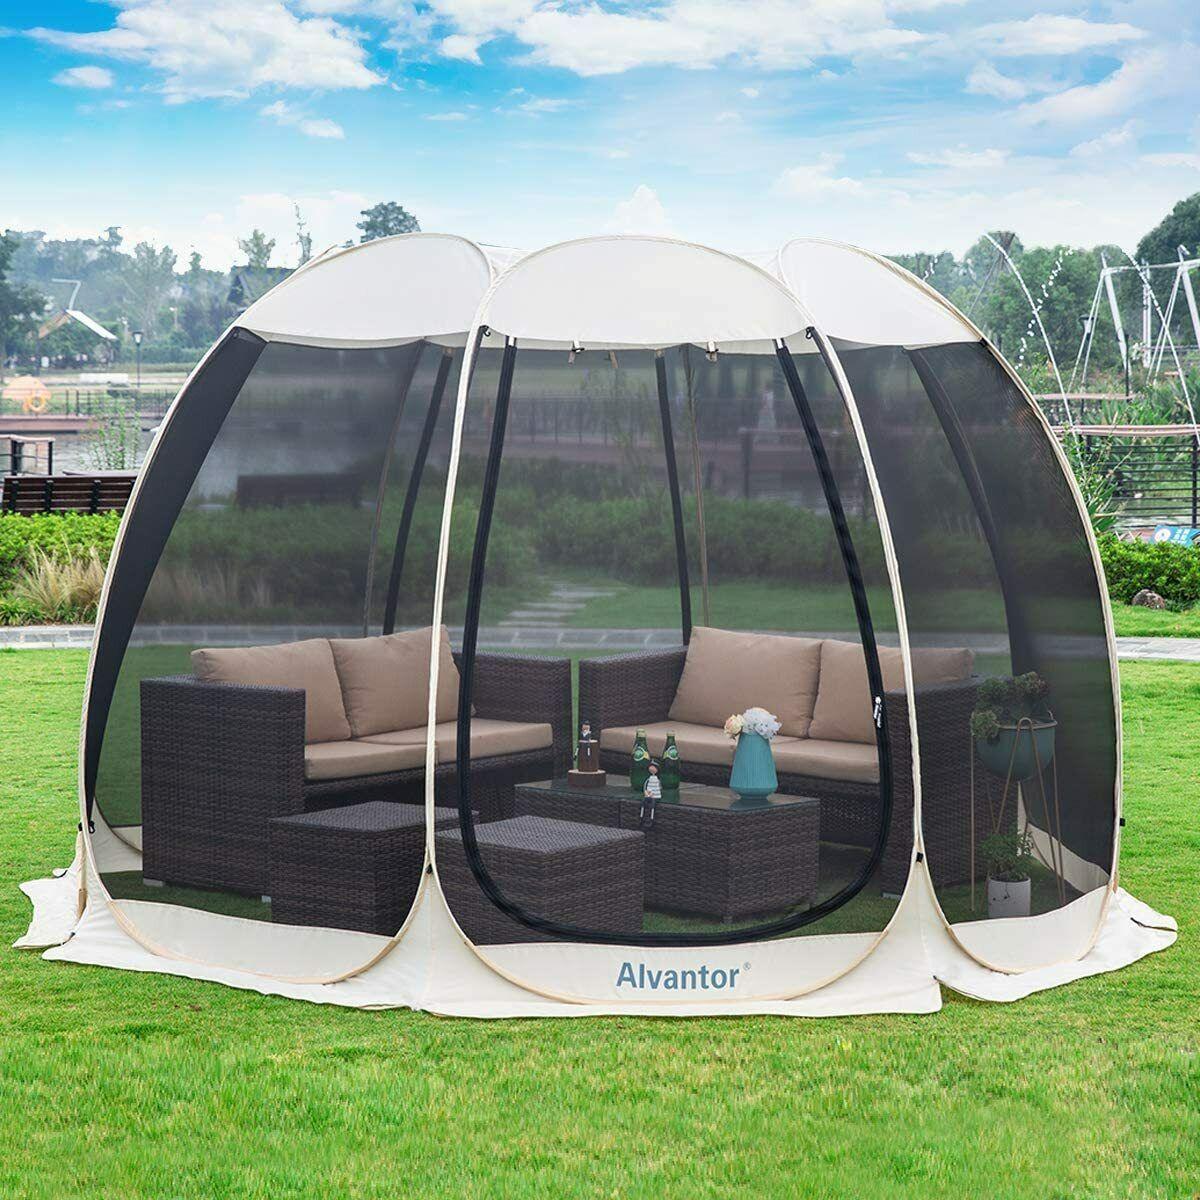 12'x12' Pop Up Screen House Outdoor Camping Tent Canopy Gaze